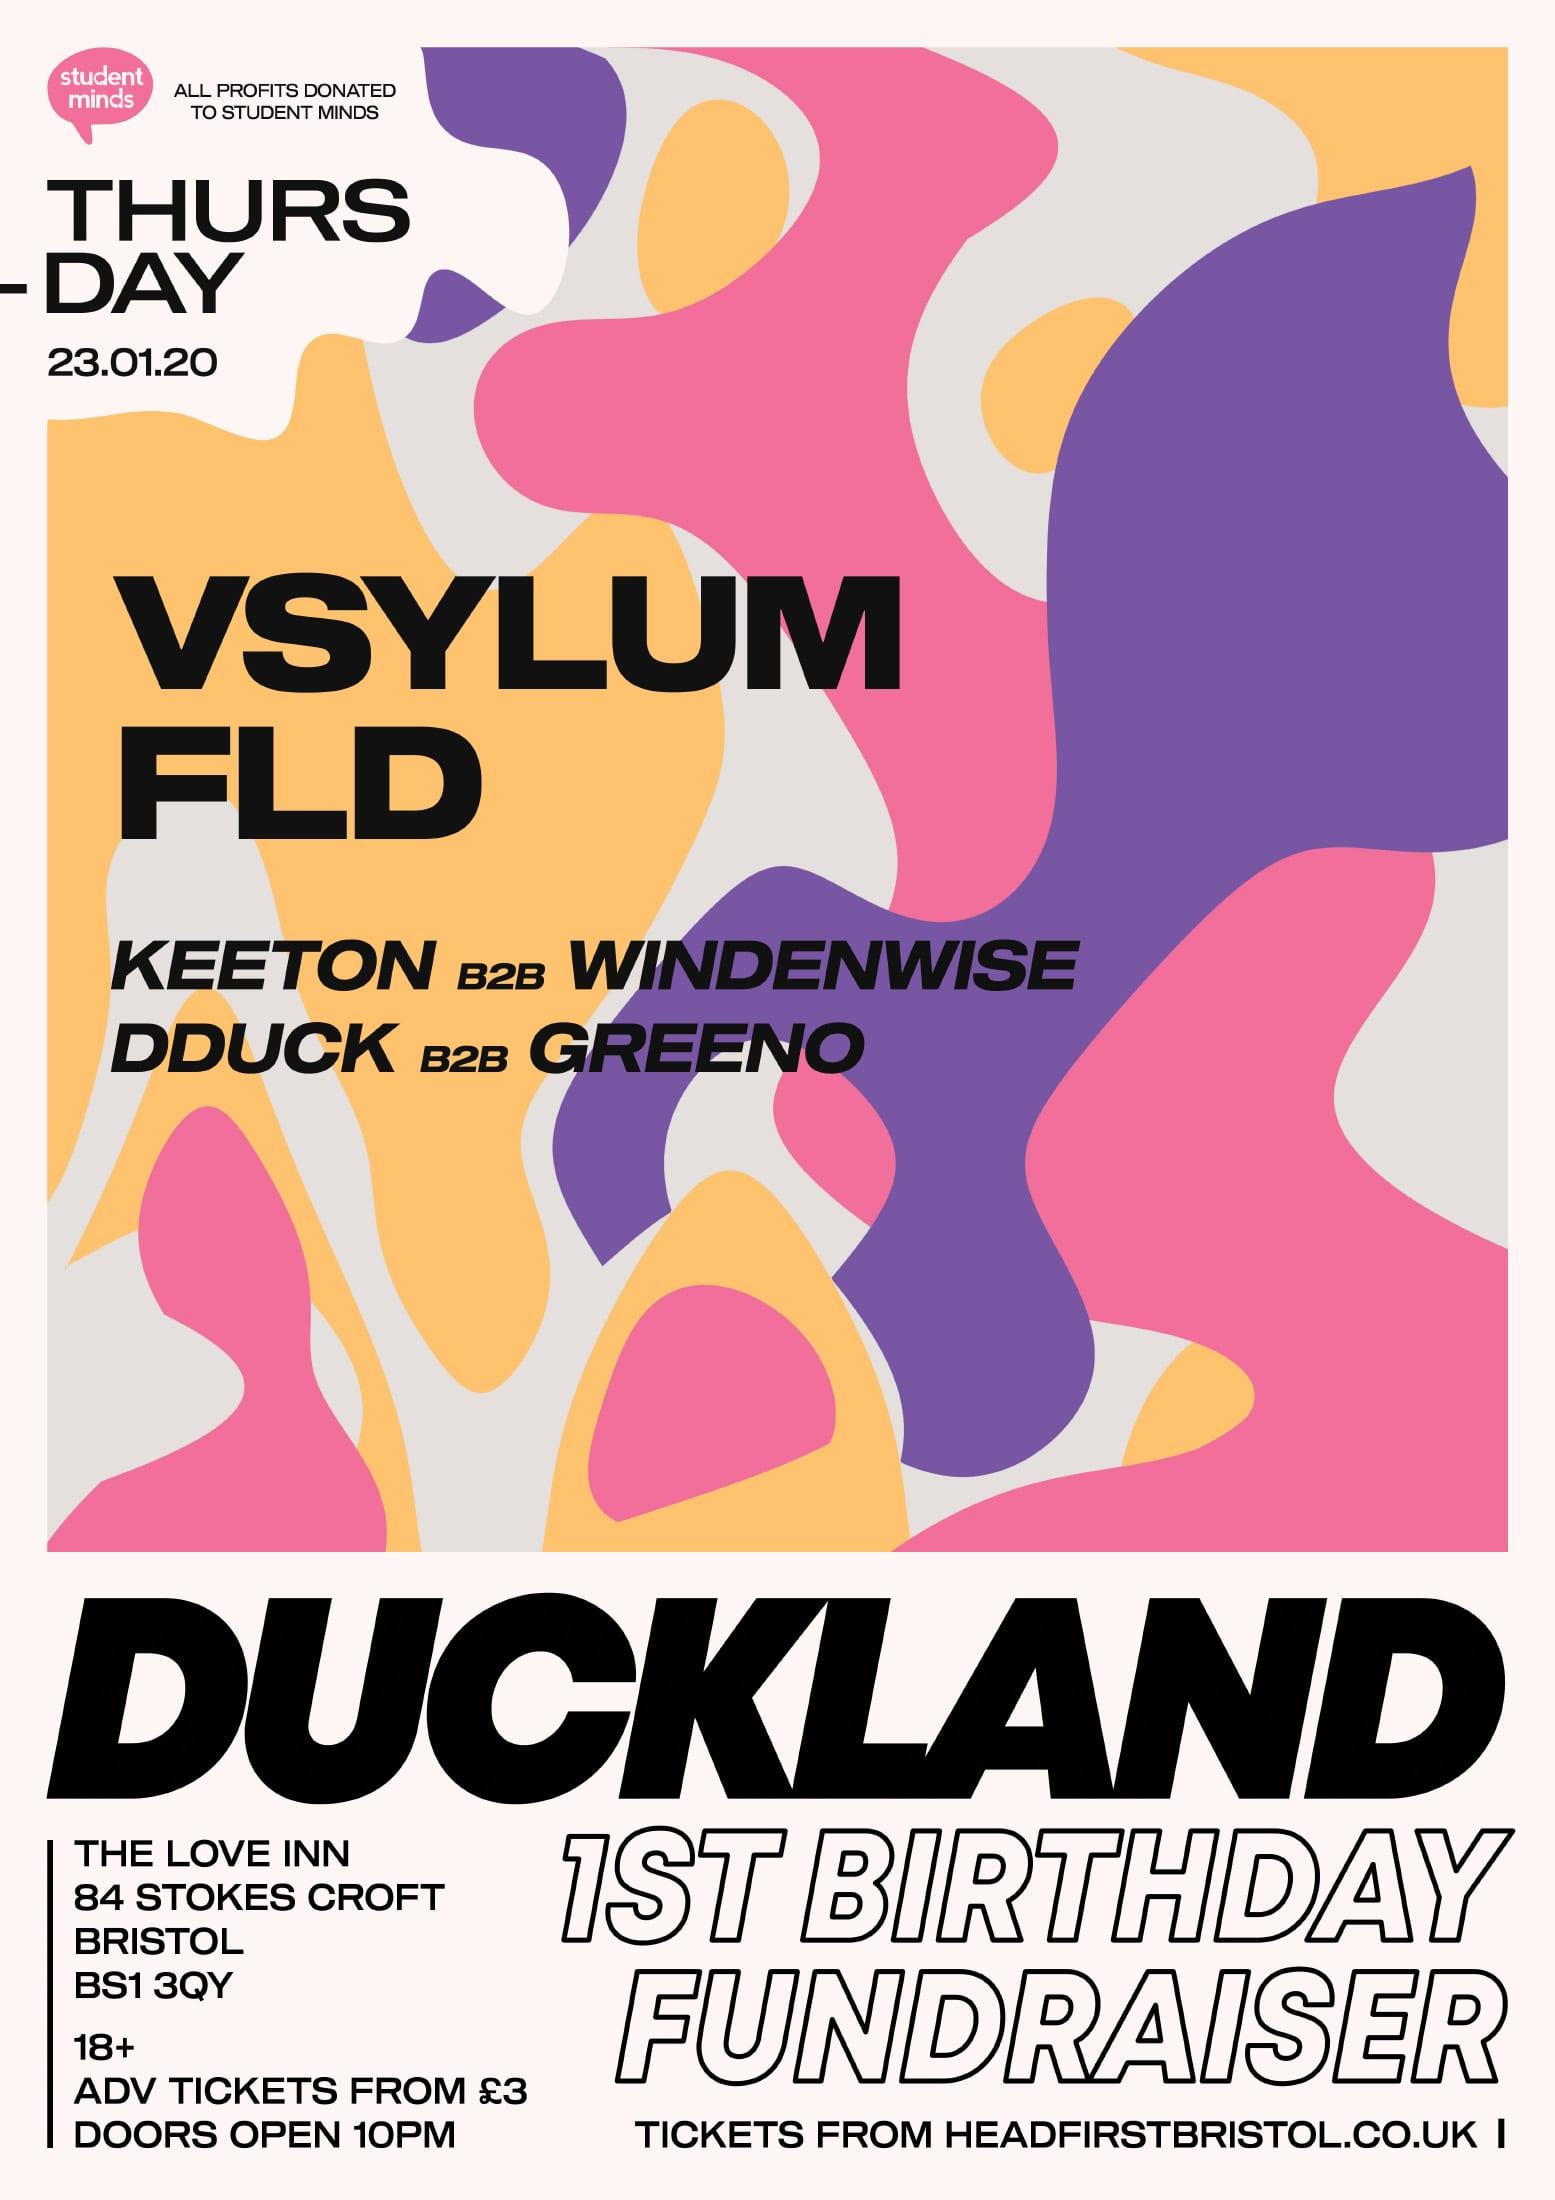 Ben Keeton Duckland StudentMinds Event Poster